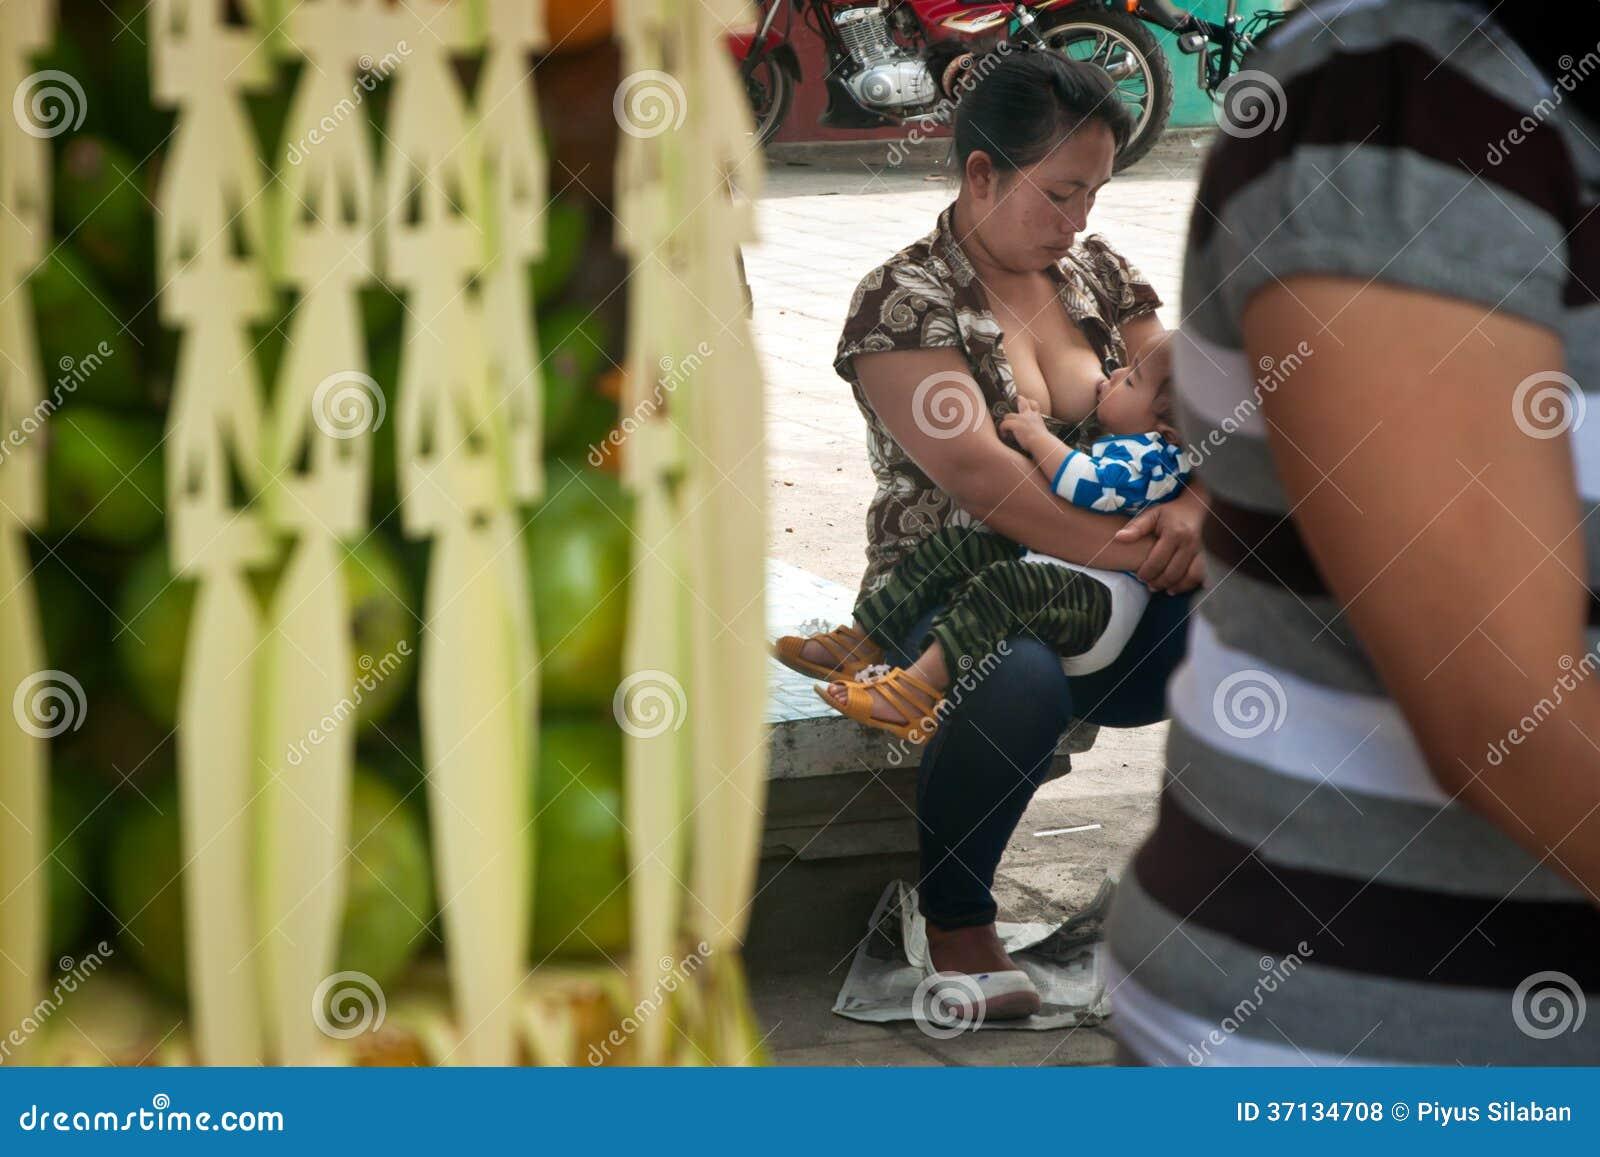 Breast-Feeding Editorial Stock Photo Image Of Easy, Girl -8016